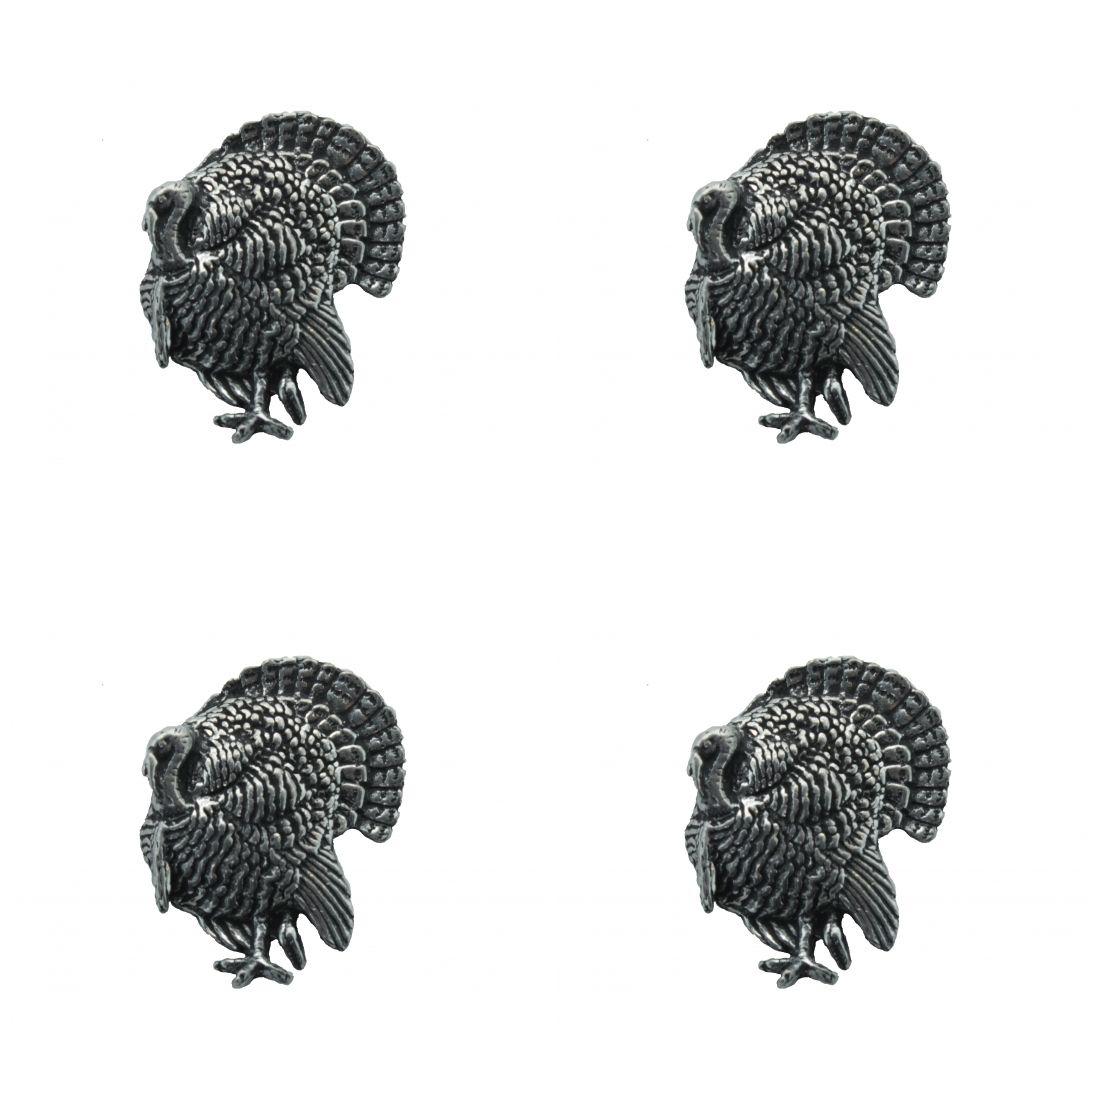 4 x Pin Anstecker Badge Pute, 2,5x2,7cm